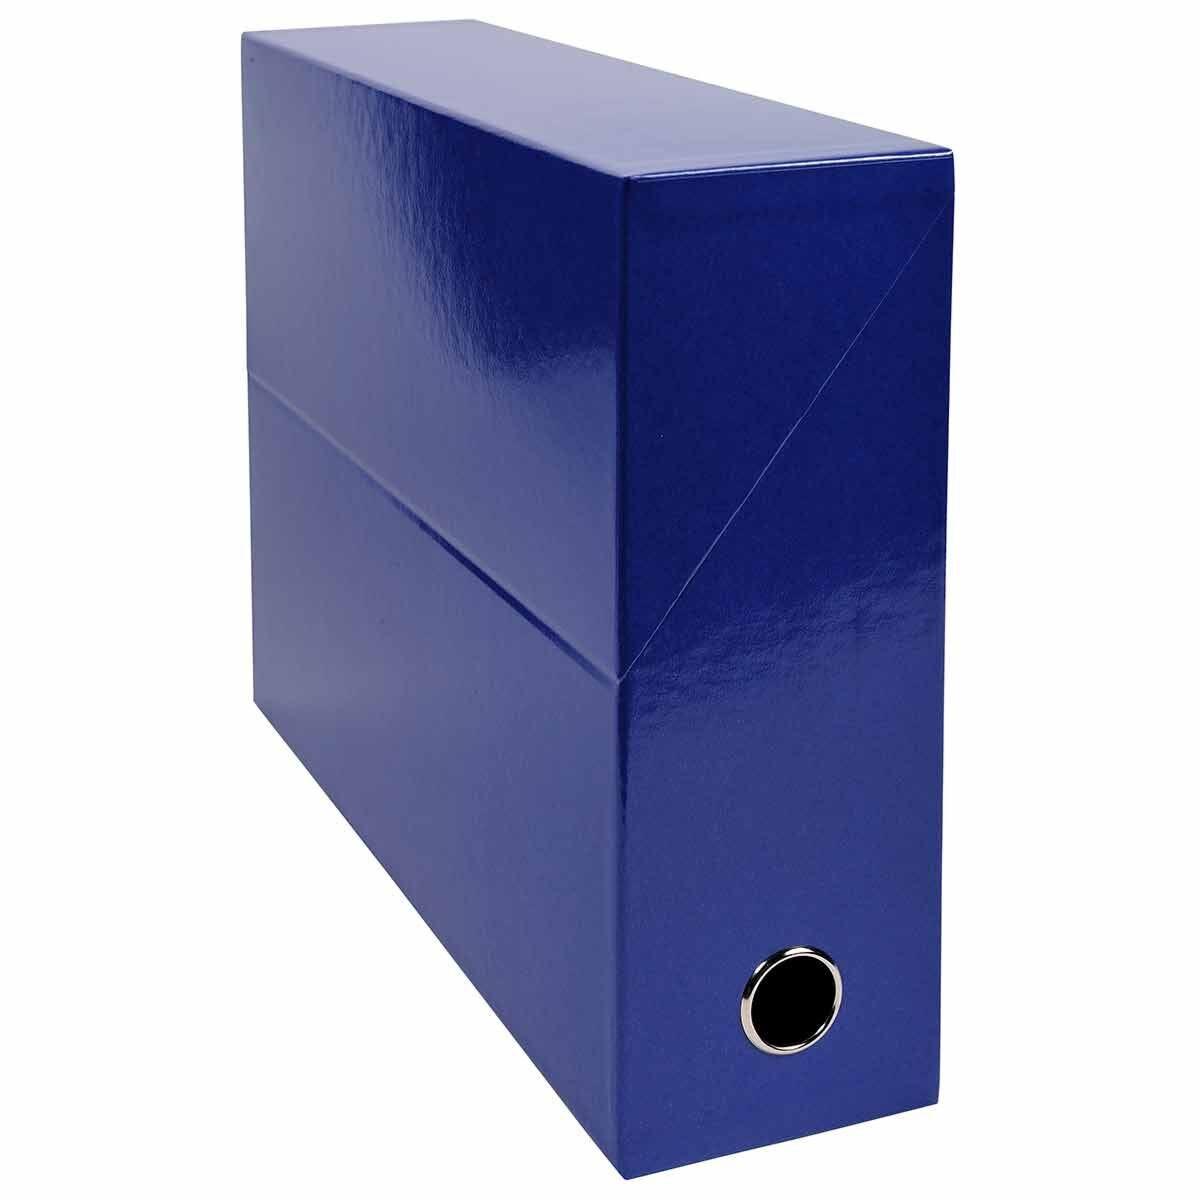 Exacompta Iderama Filing Box 90mm Pack of 5 Dark Blue